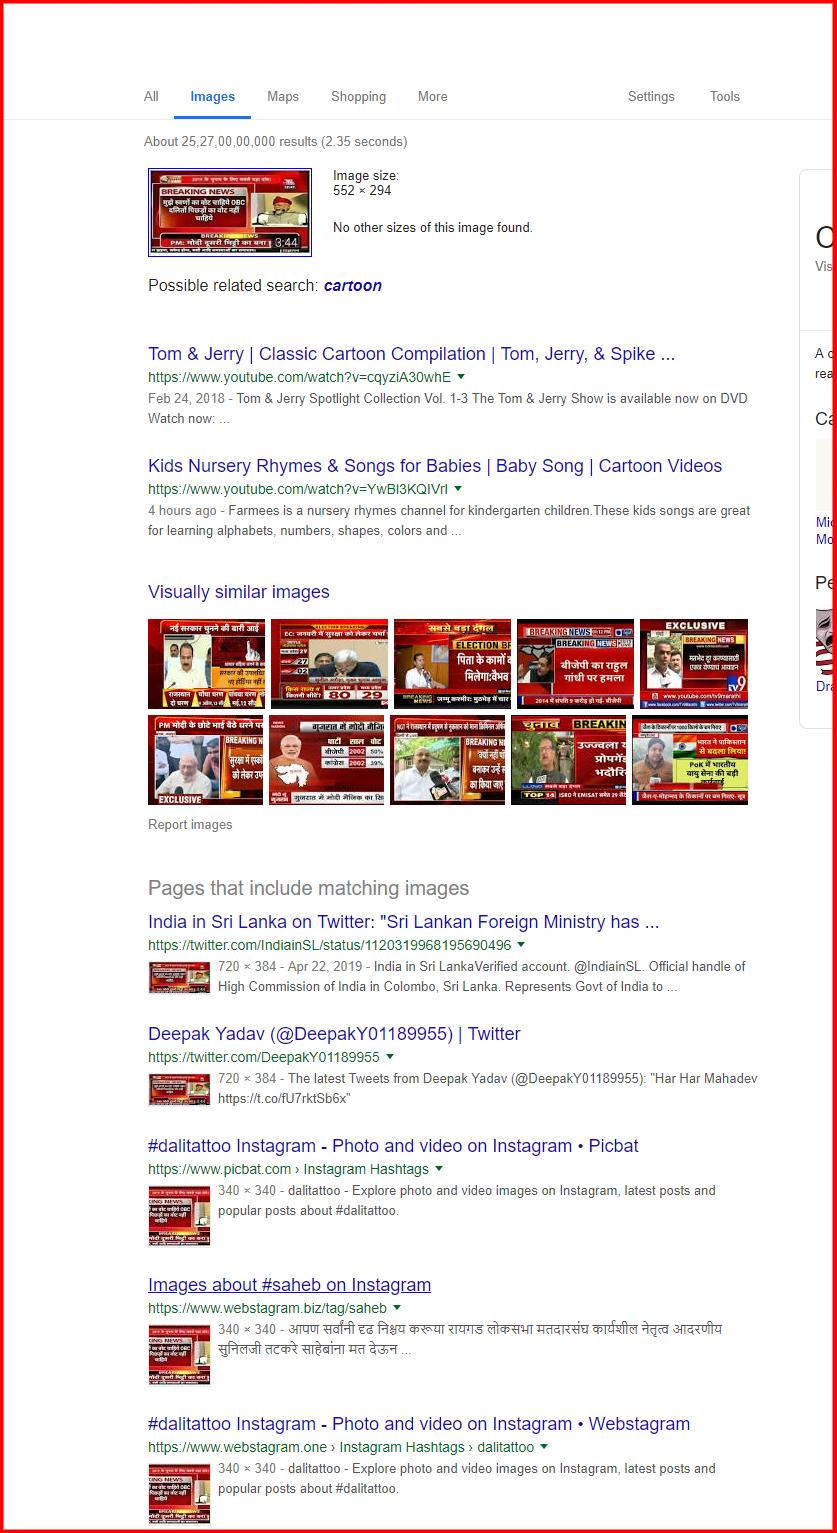 screenshot-www.google.co.in-2019.05.23-07-08-02.png